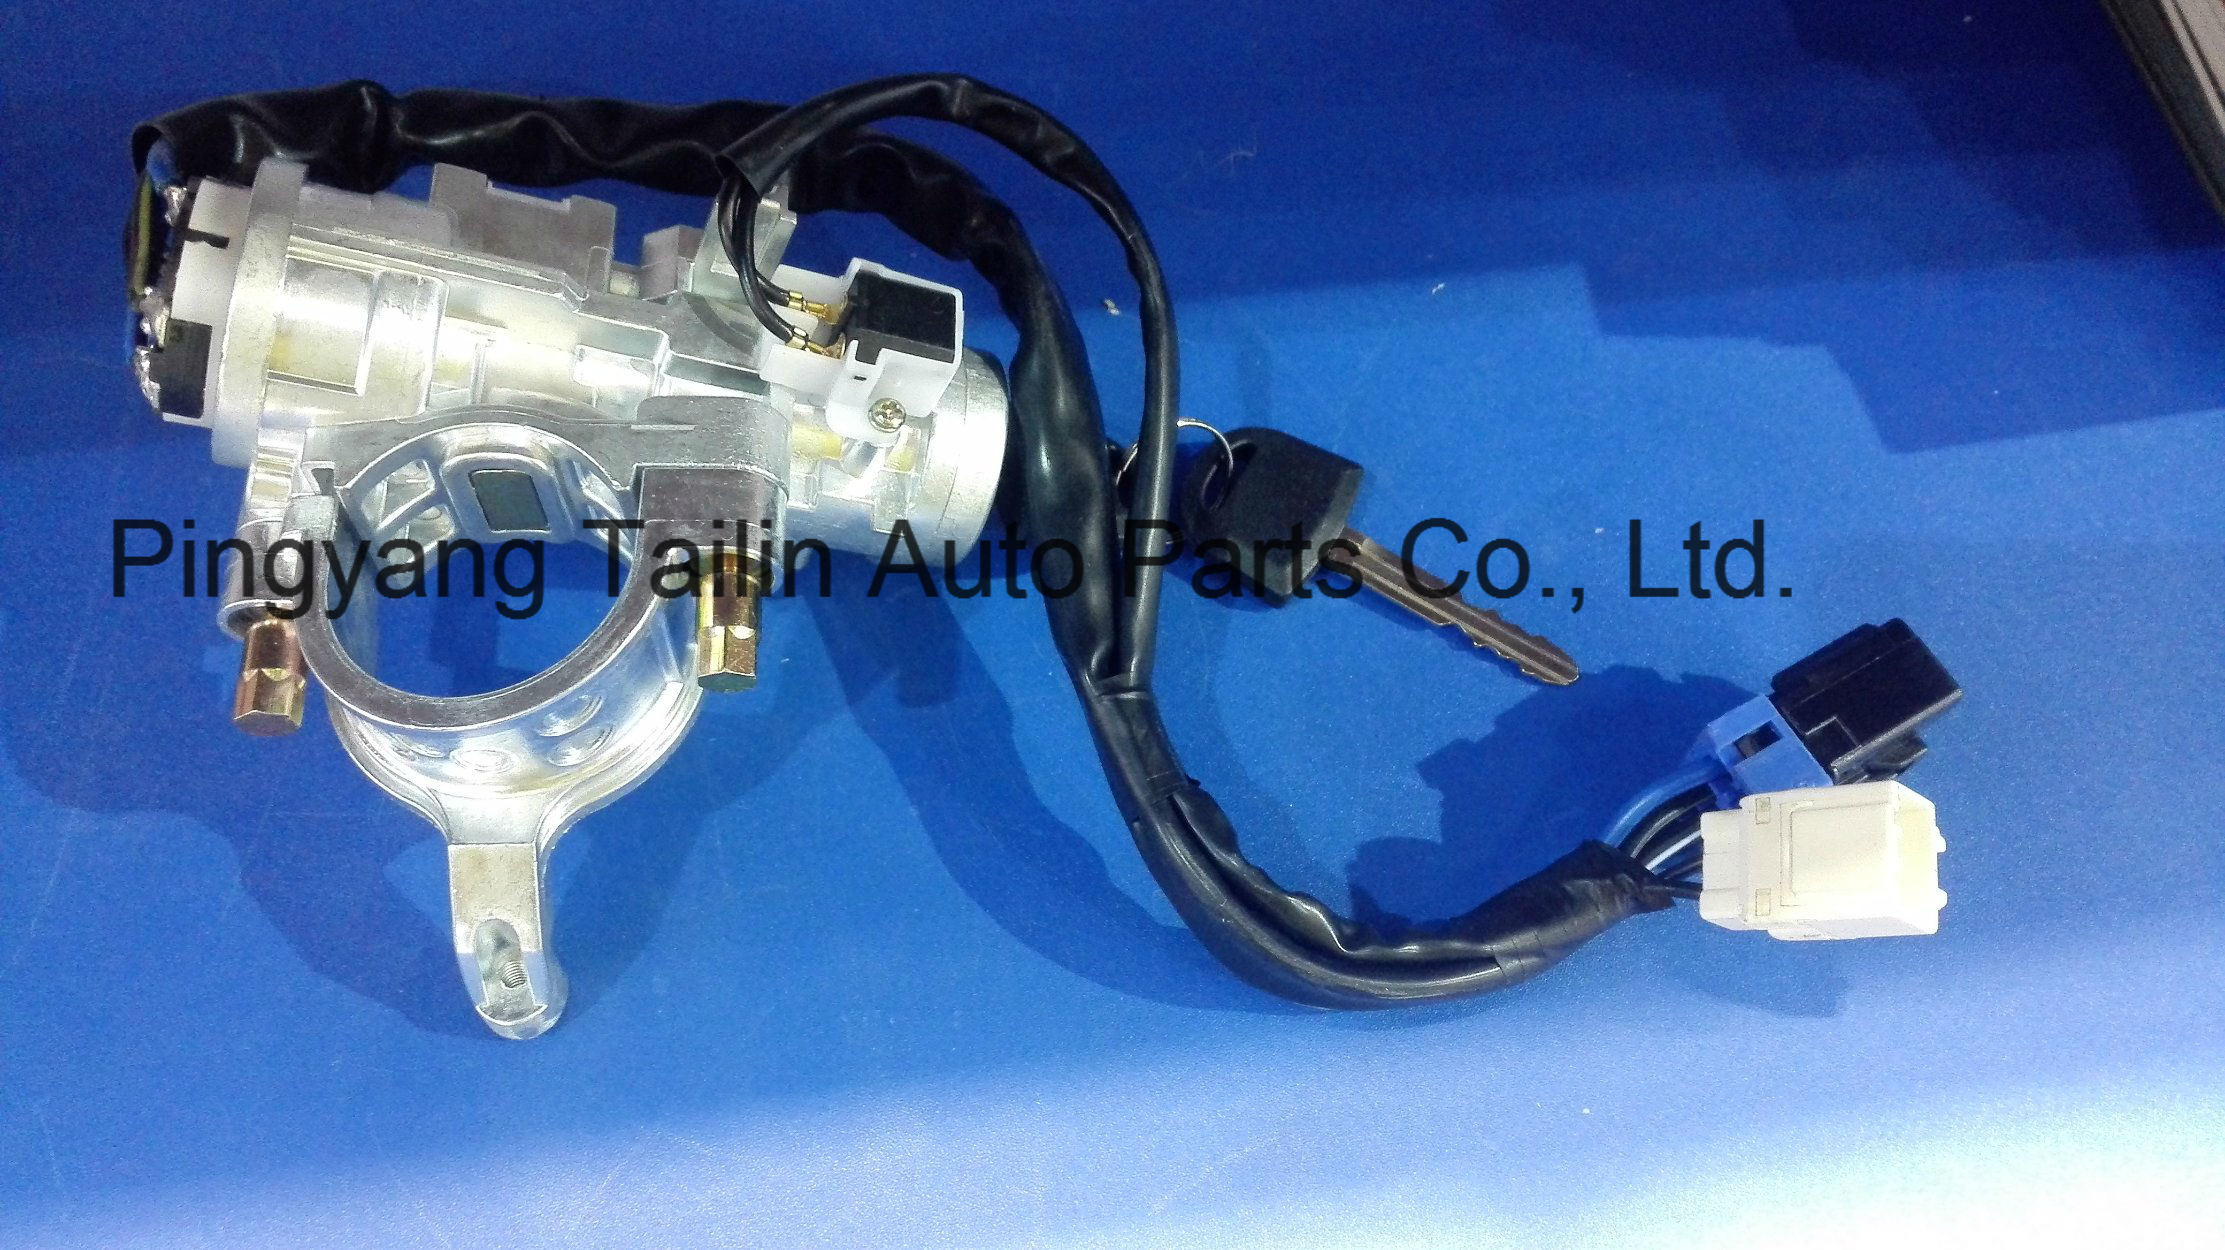 Ignition Switch for Mitsubishi Strada